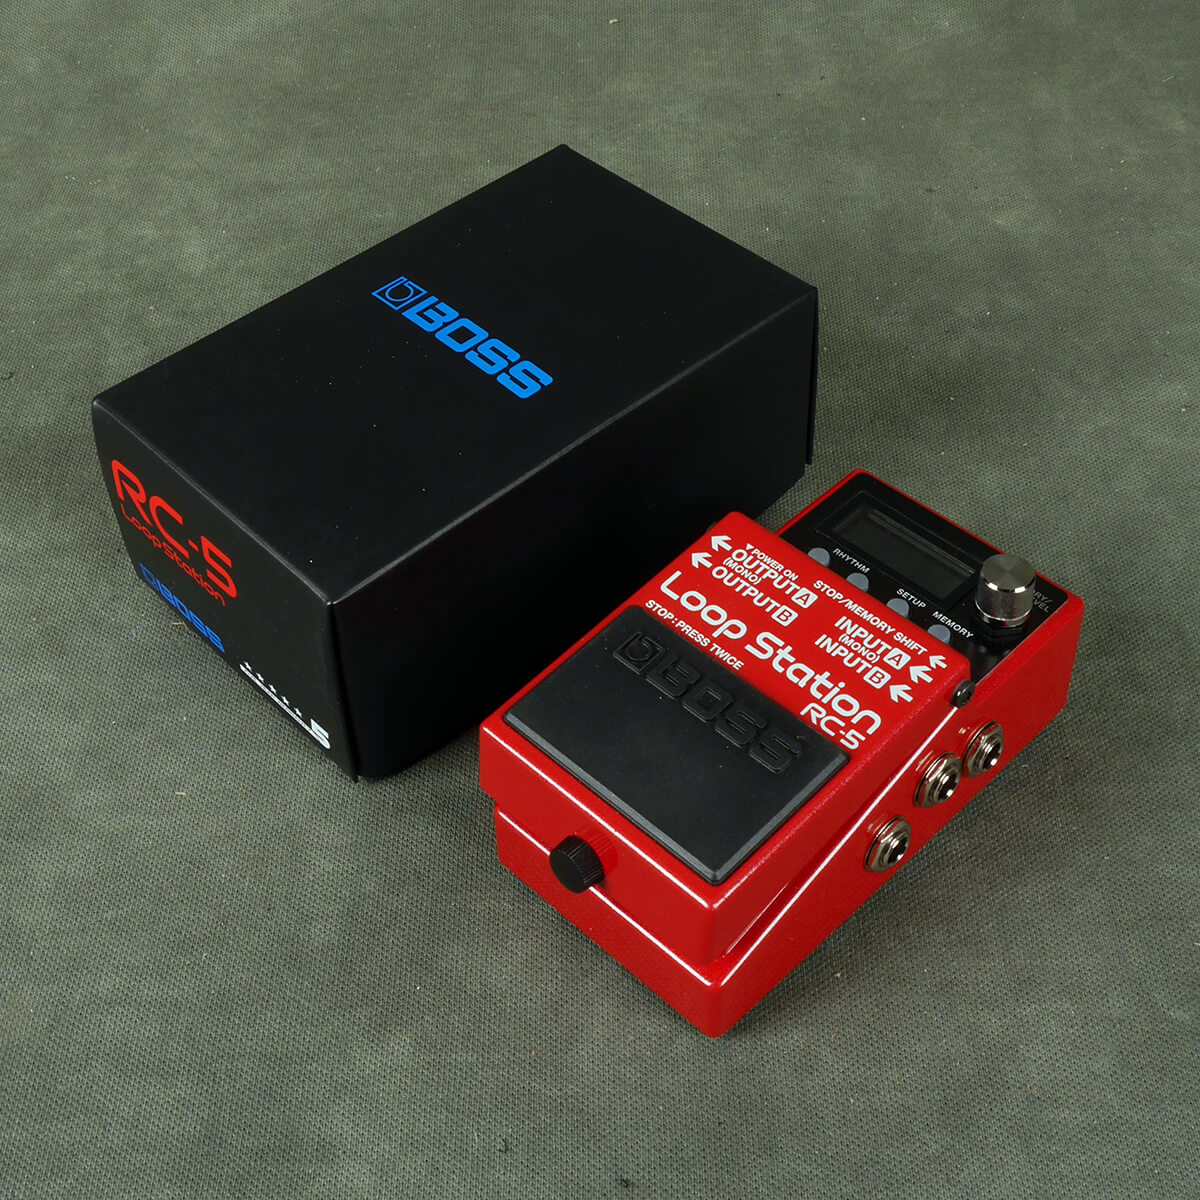 Boss RC-5 Looper FX Pedal w/Box - 2nd Hand